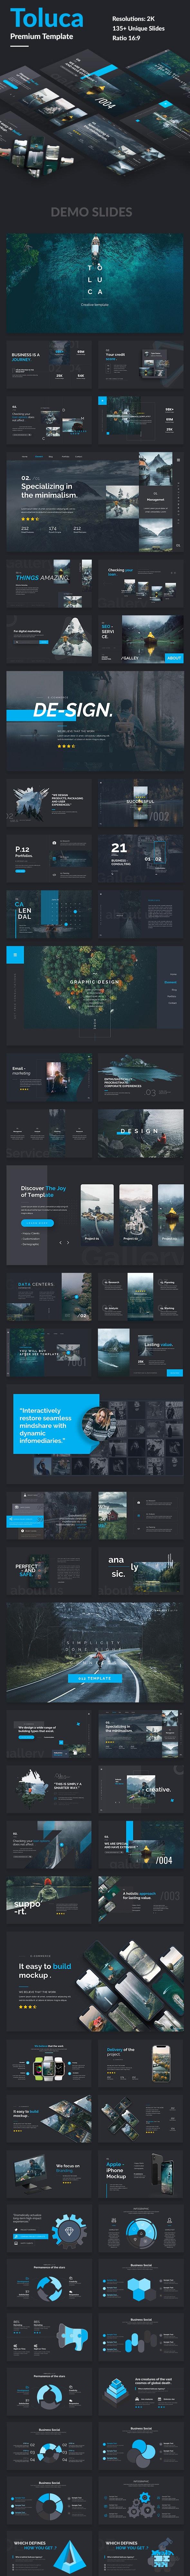 Toluca Premium Design Powerpoint Template - Creative PowerPoint Templates